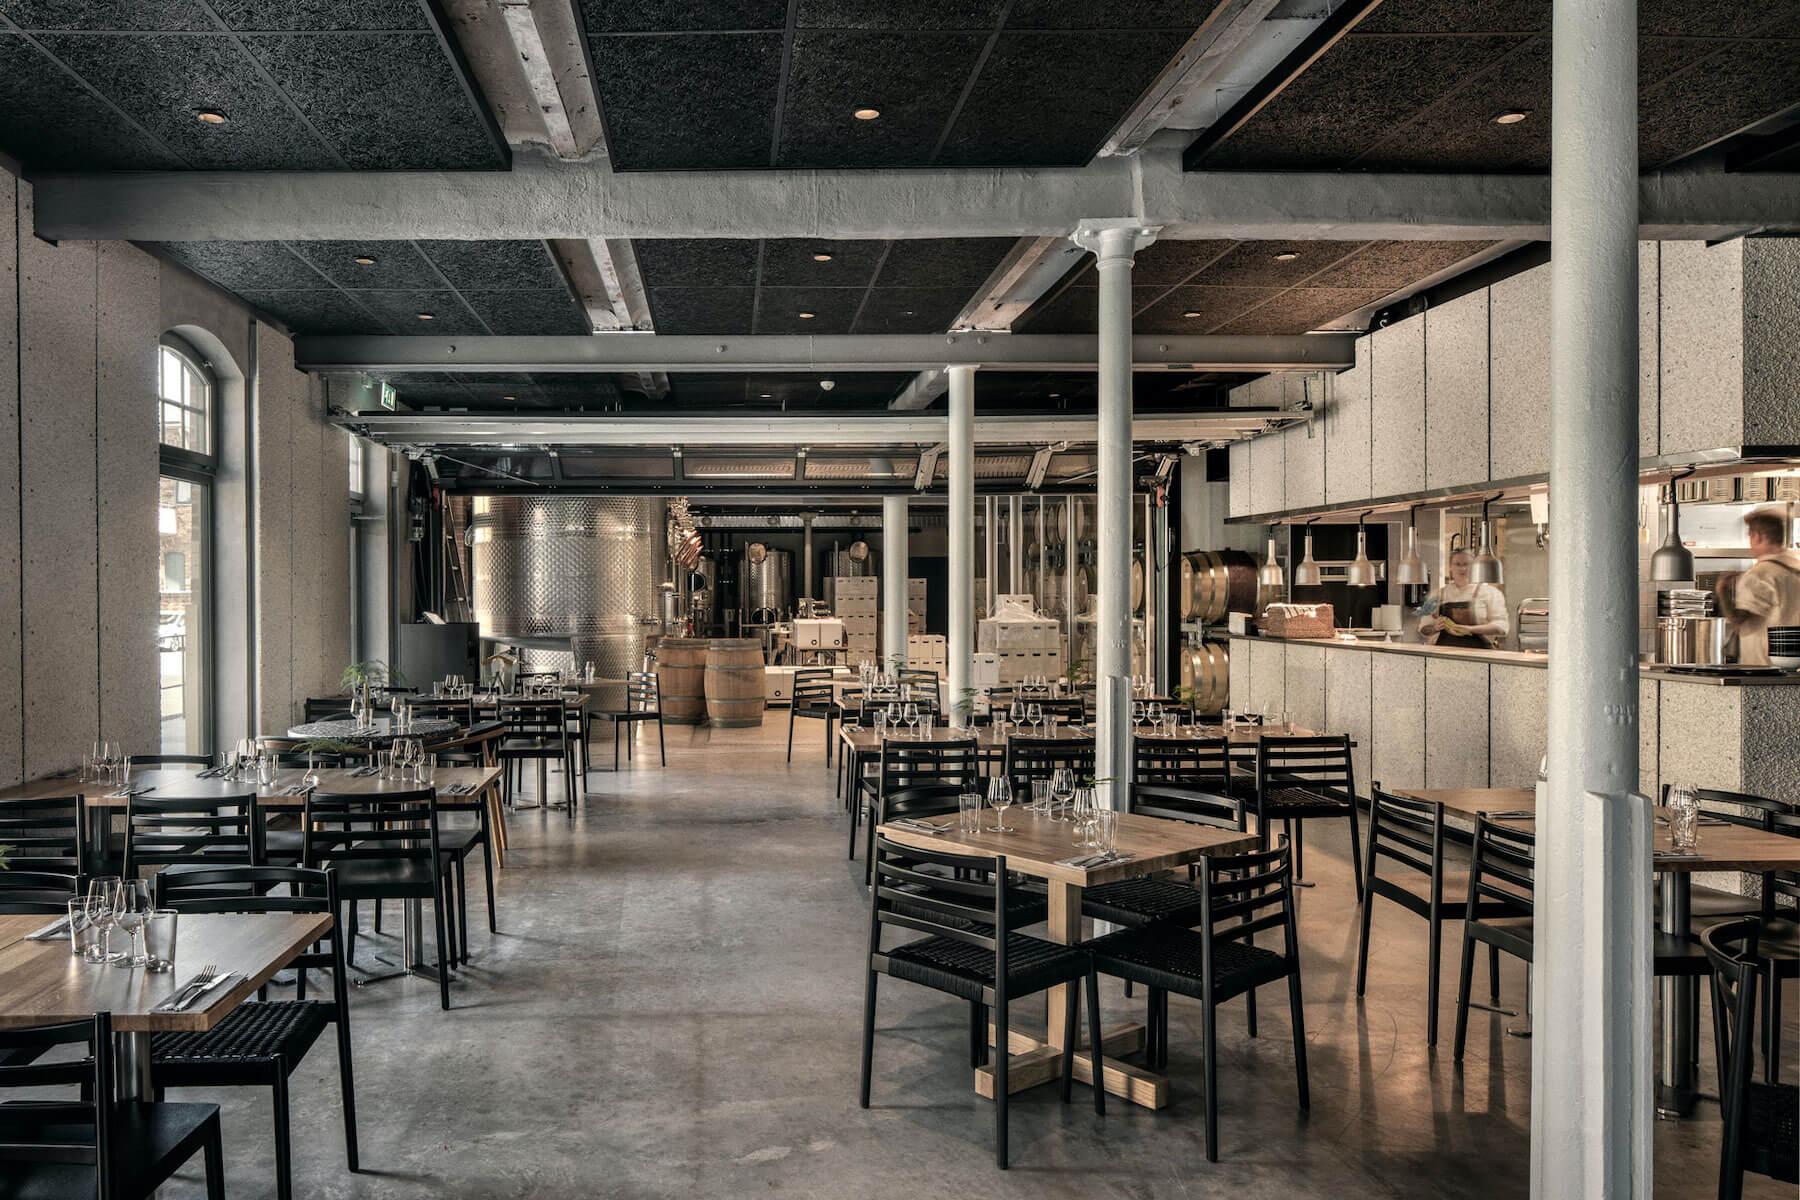 Wine mechanics restaurant seating arrangement